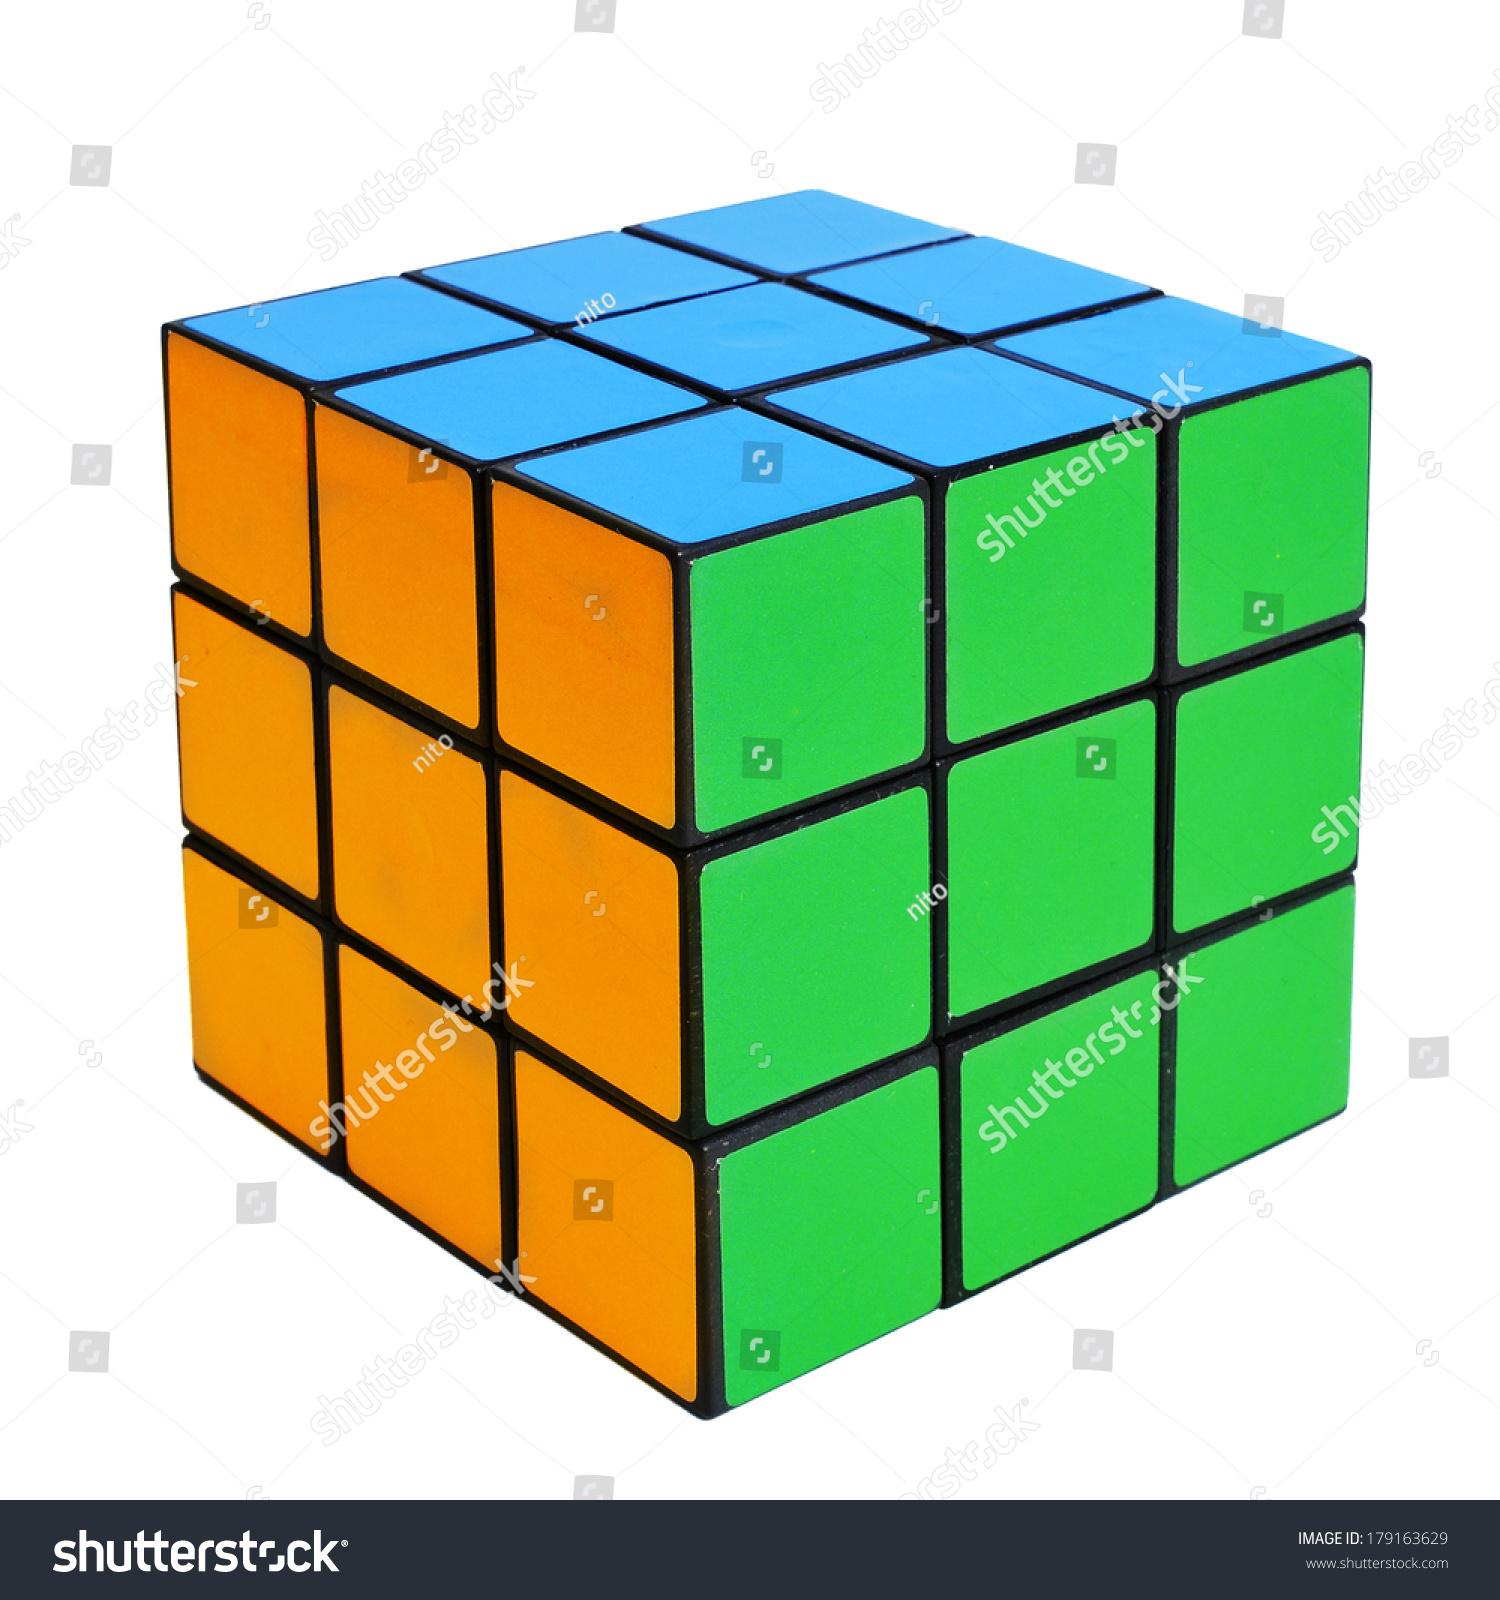 Tarragona spain february 3 2014 rubiks cube on a for Rubik espana